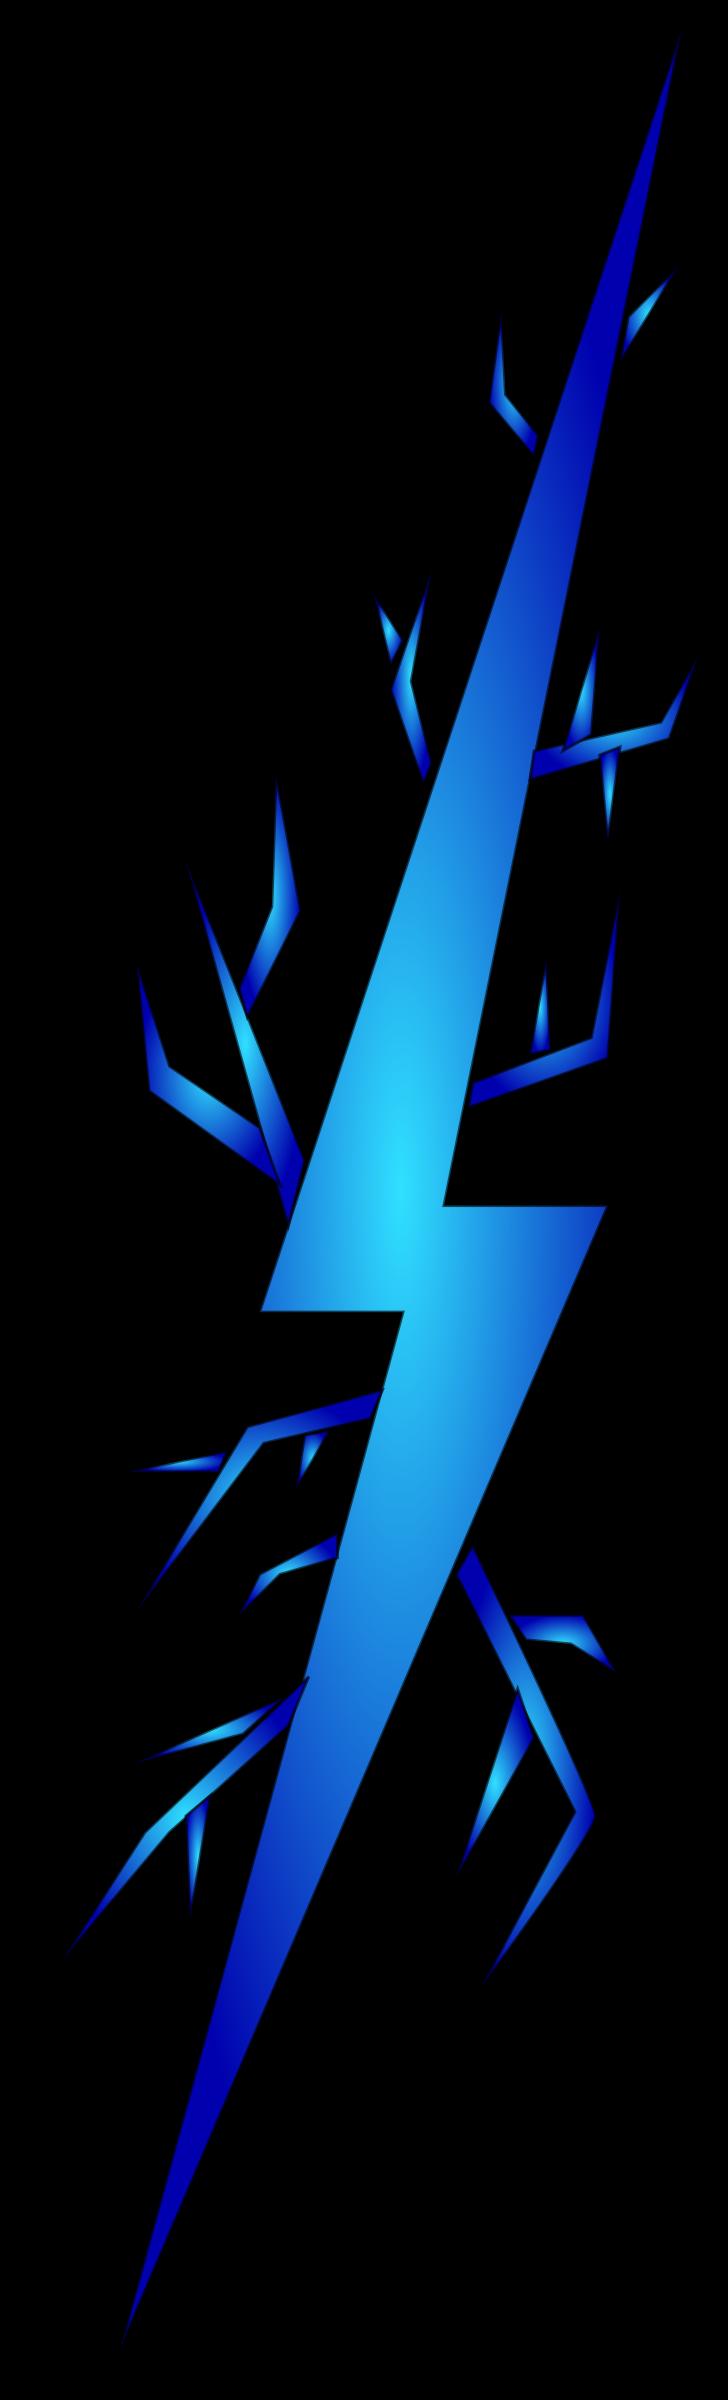 Cartoon Lighting Bolt Clipart.